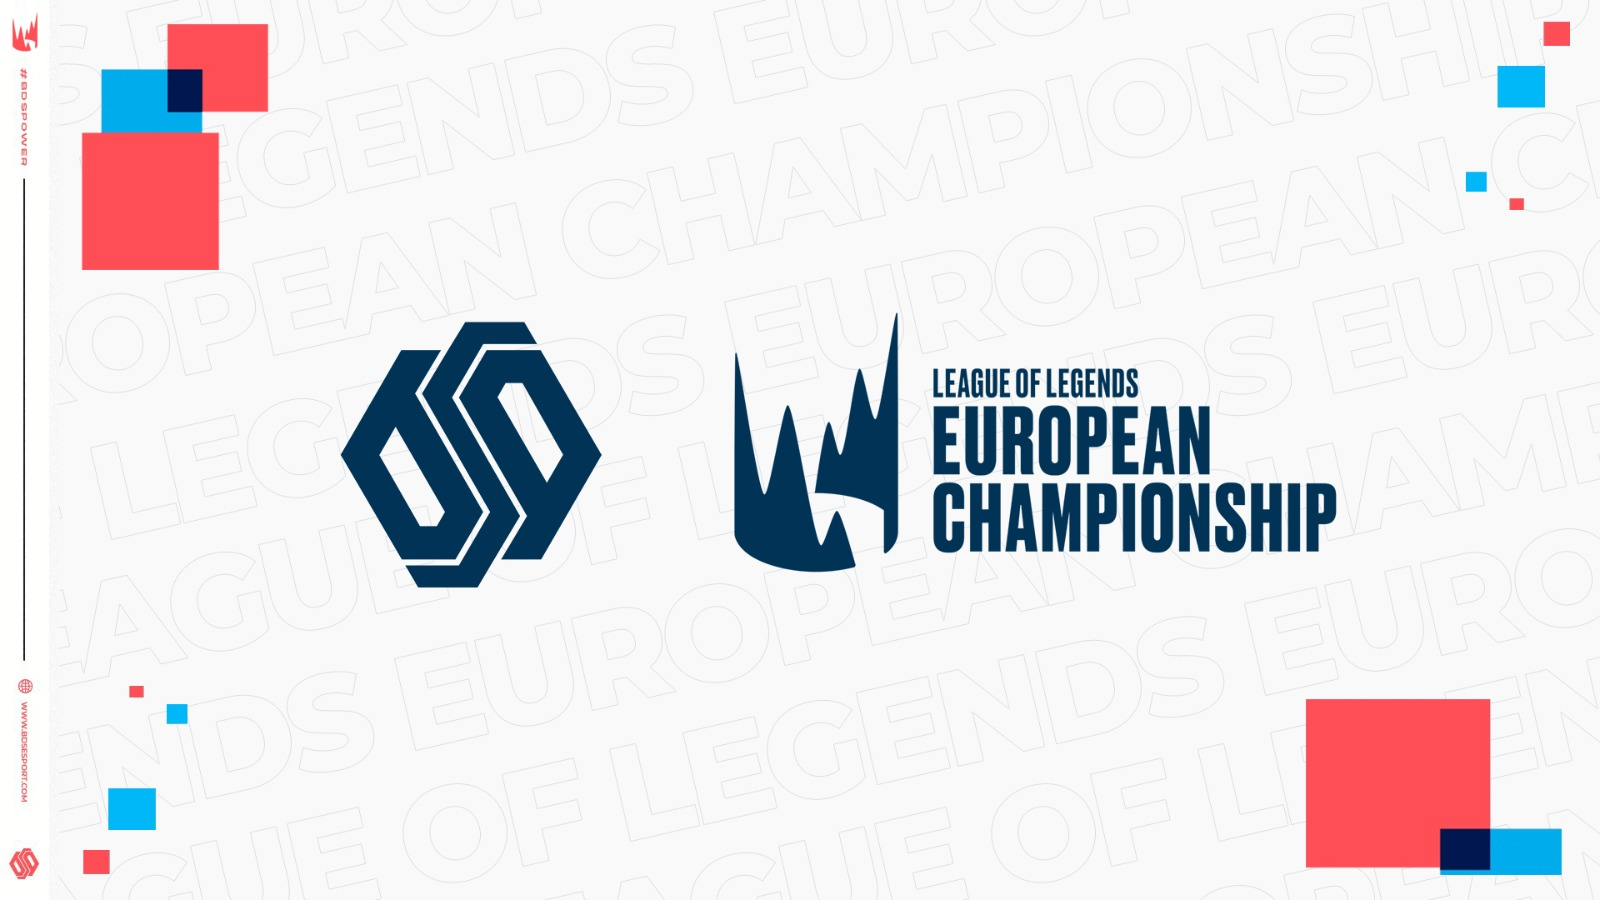 Schalke 04 LEC spot sold to Team BDS for €26.5m thumbnail